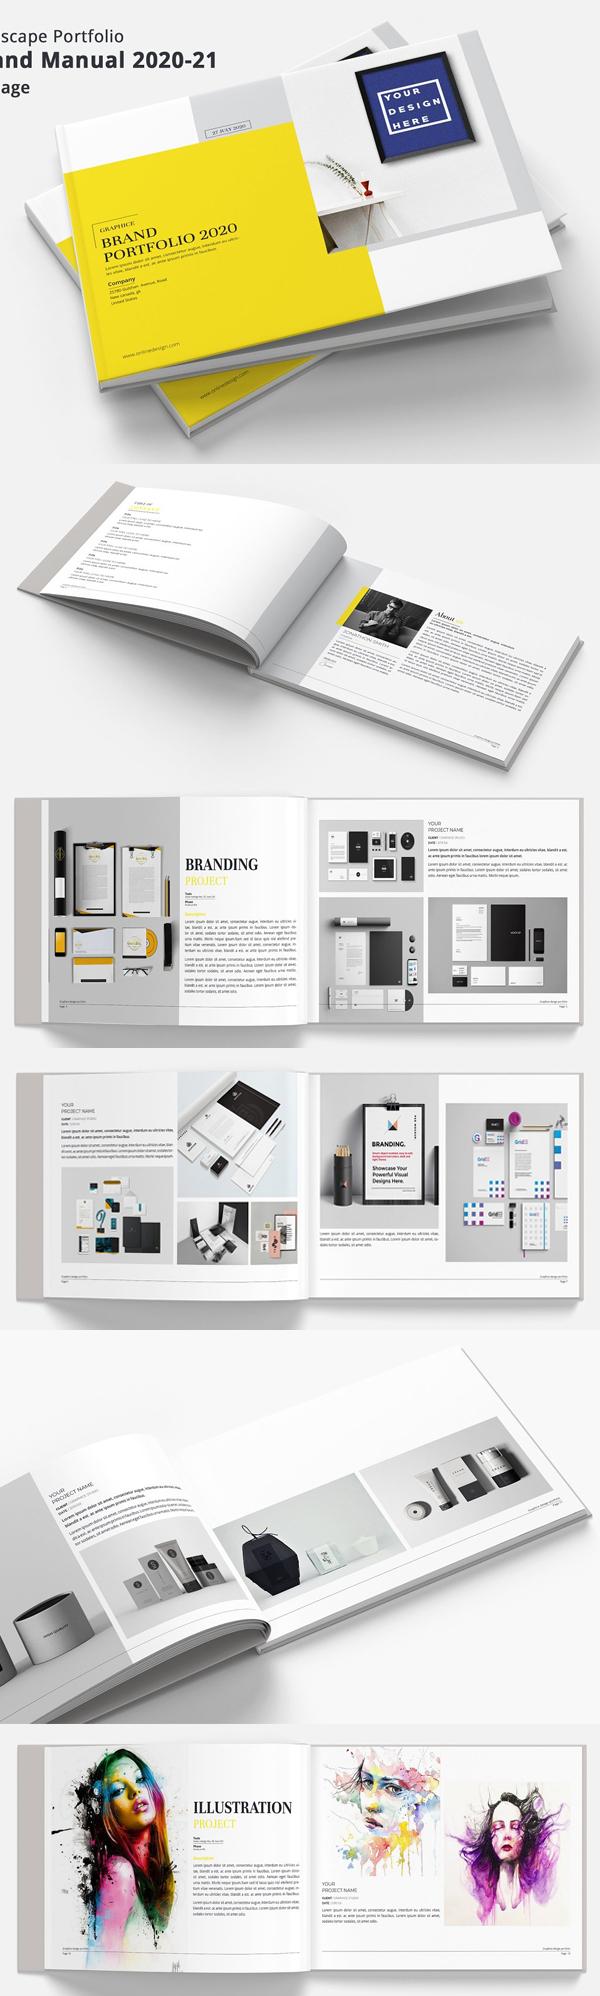 Brand Manual Portfolio